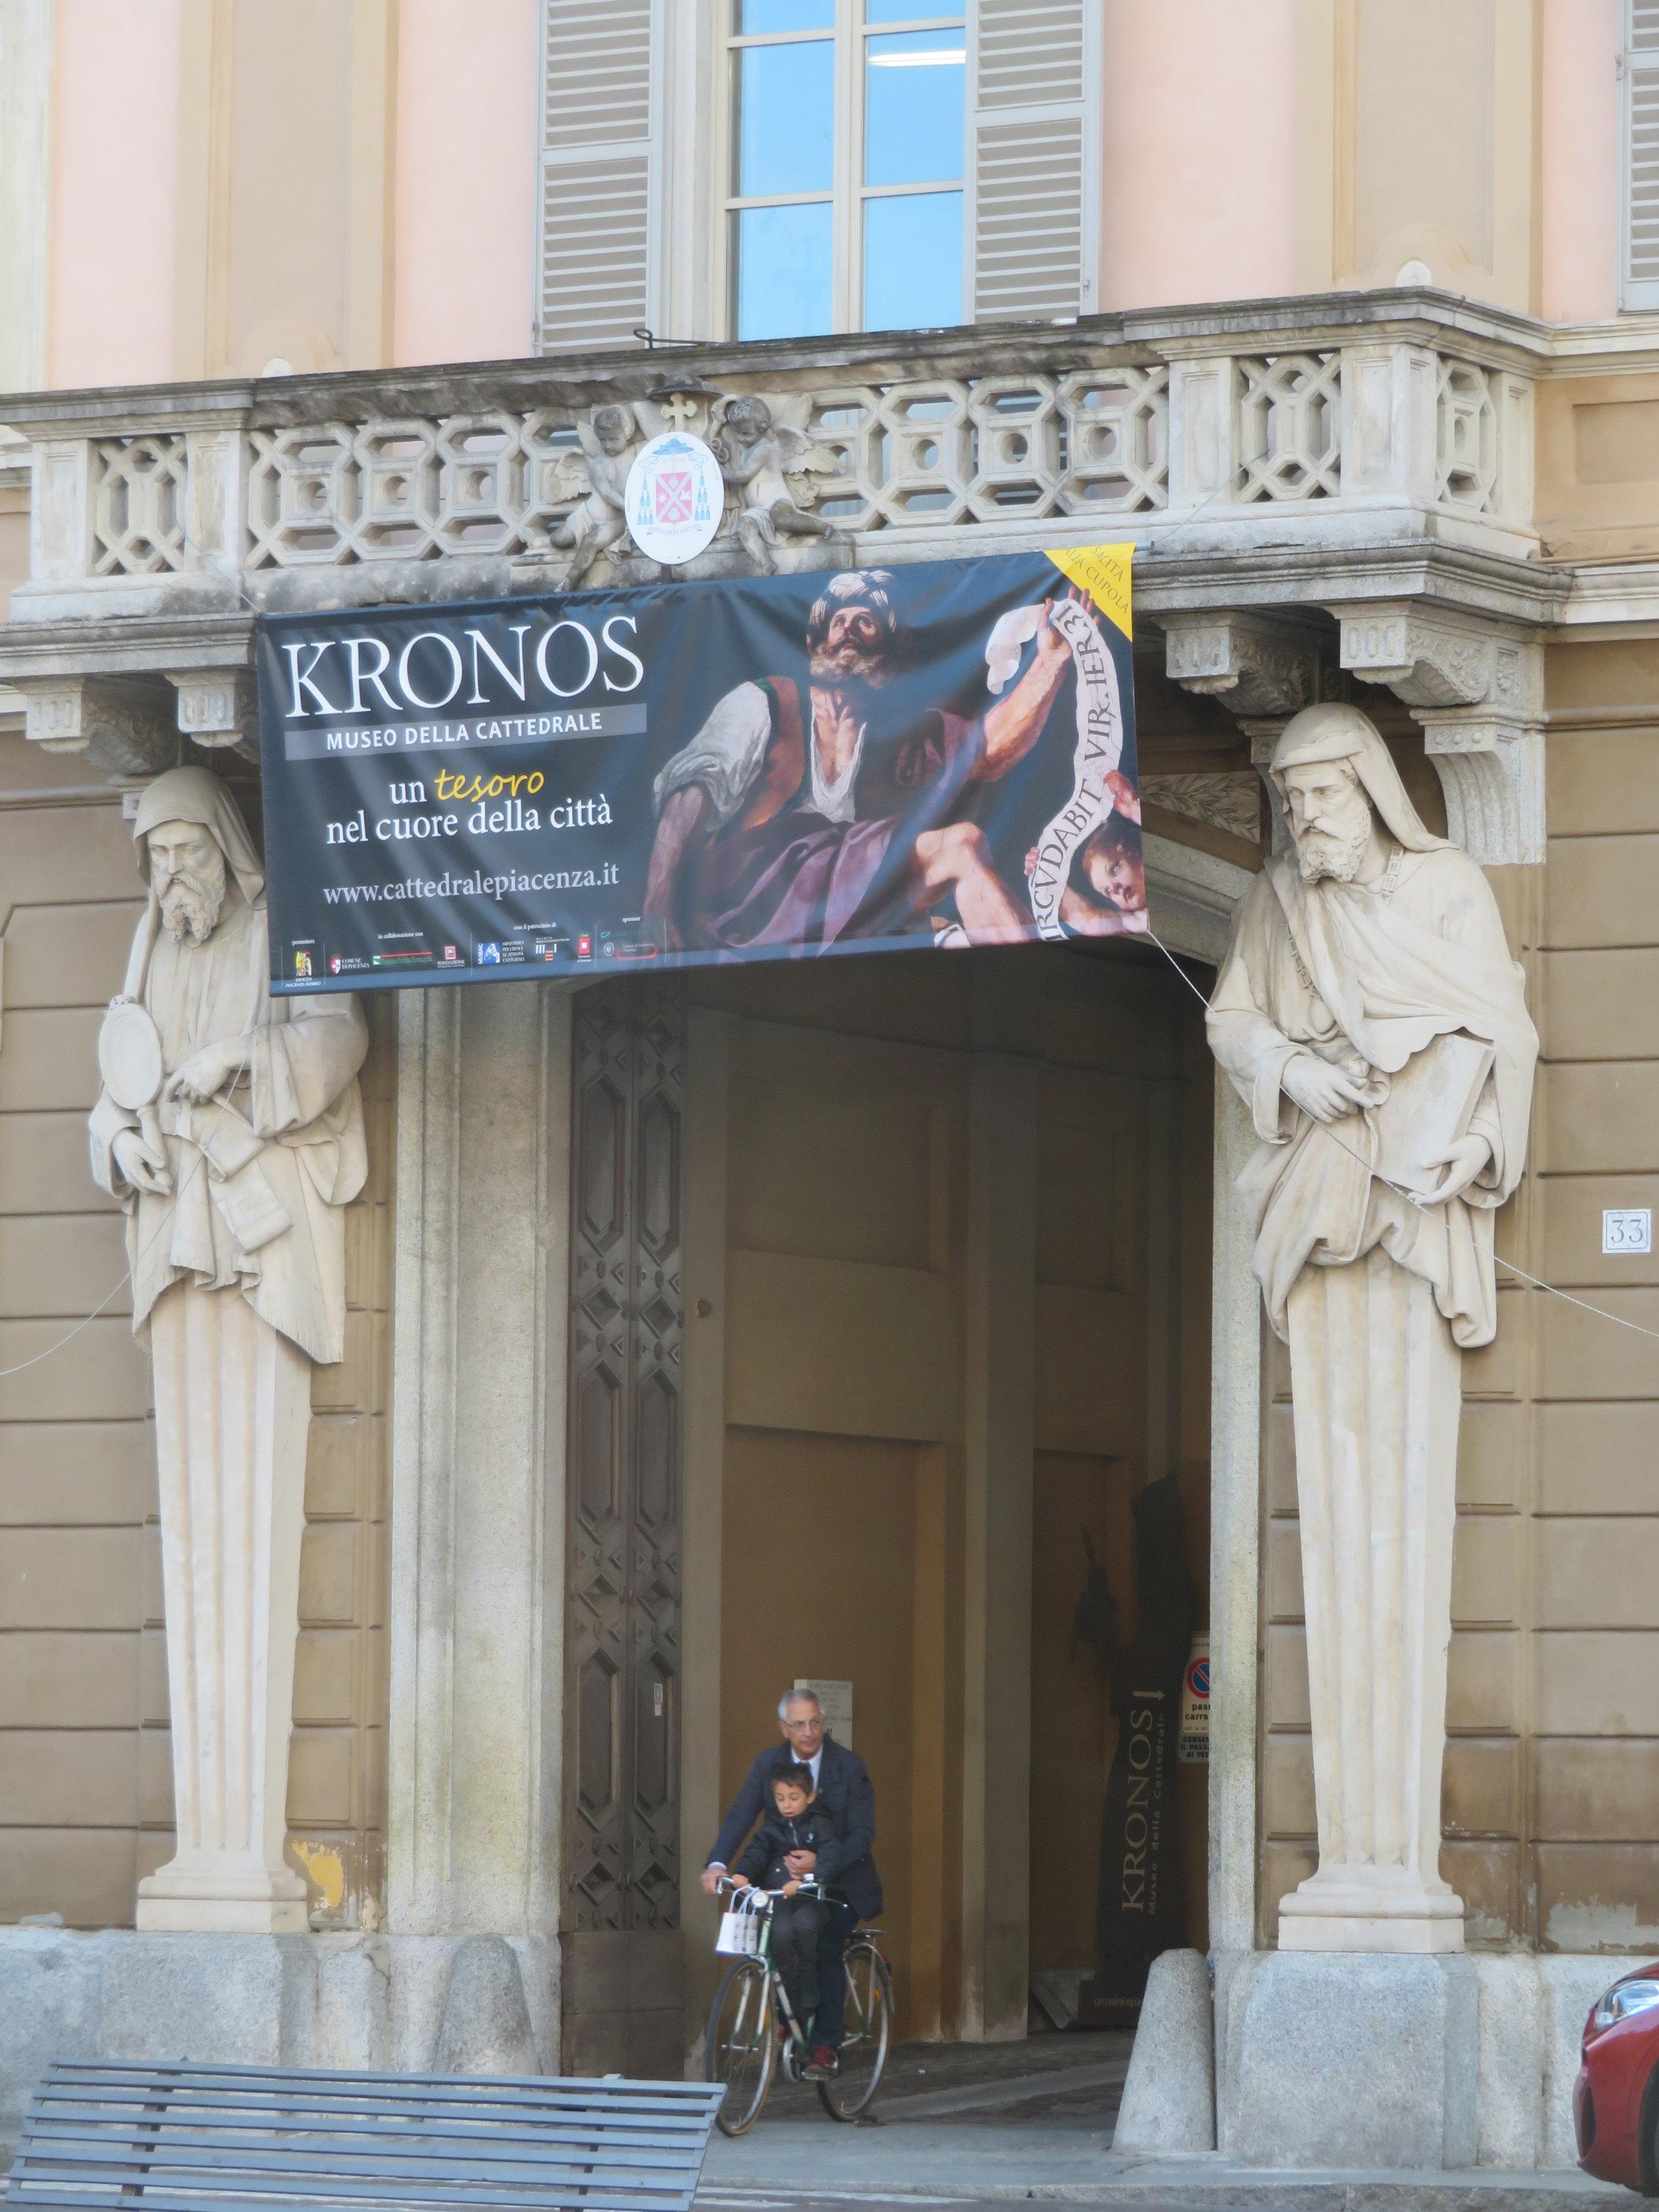 Duomo Museum-Great statues